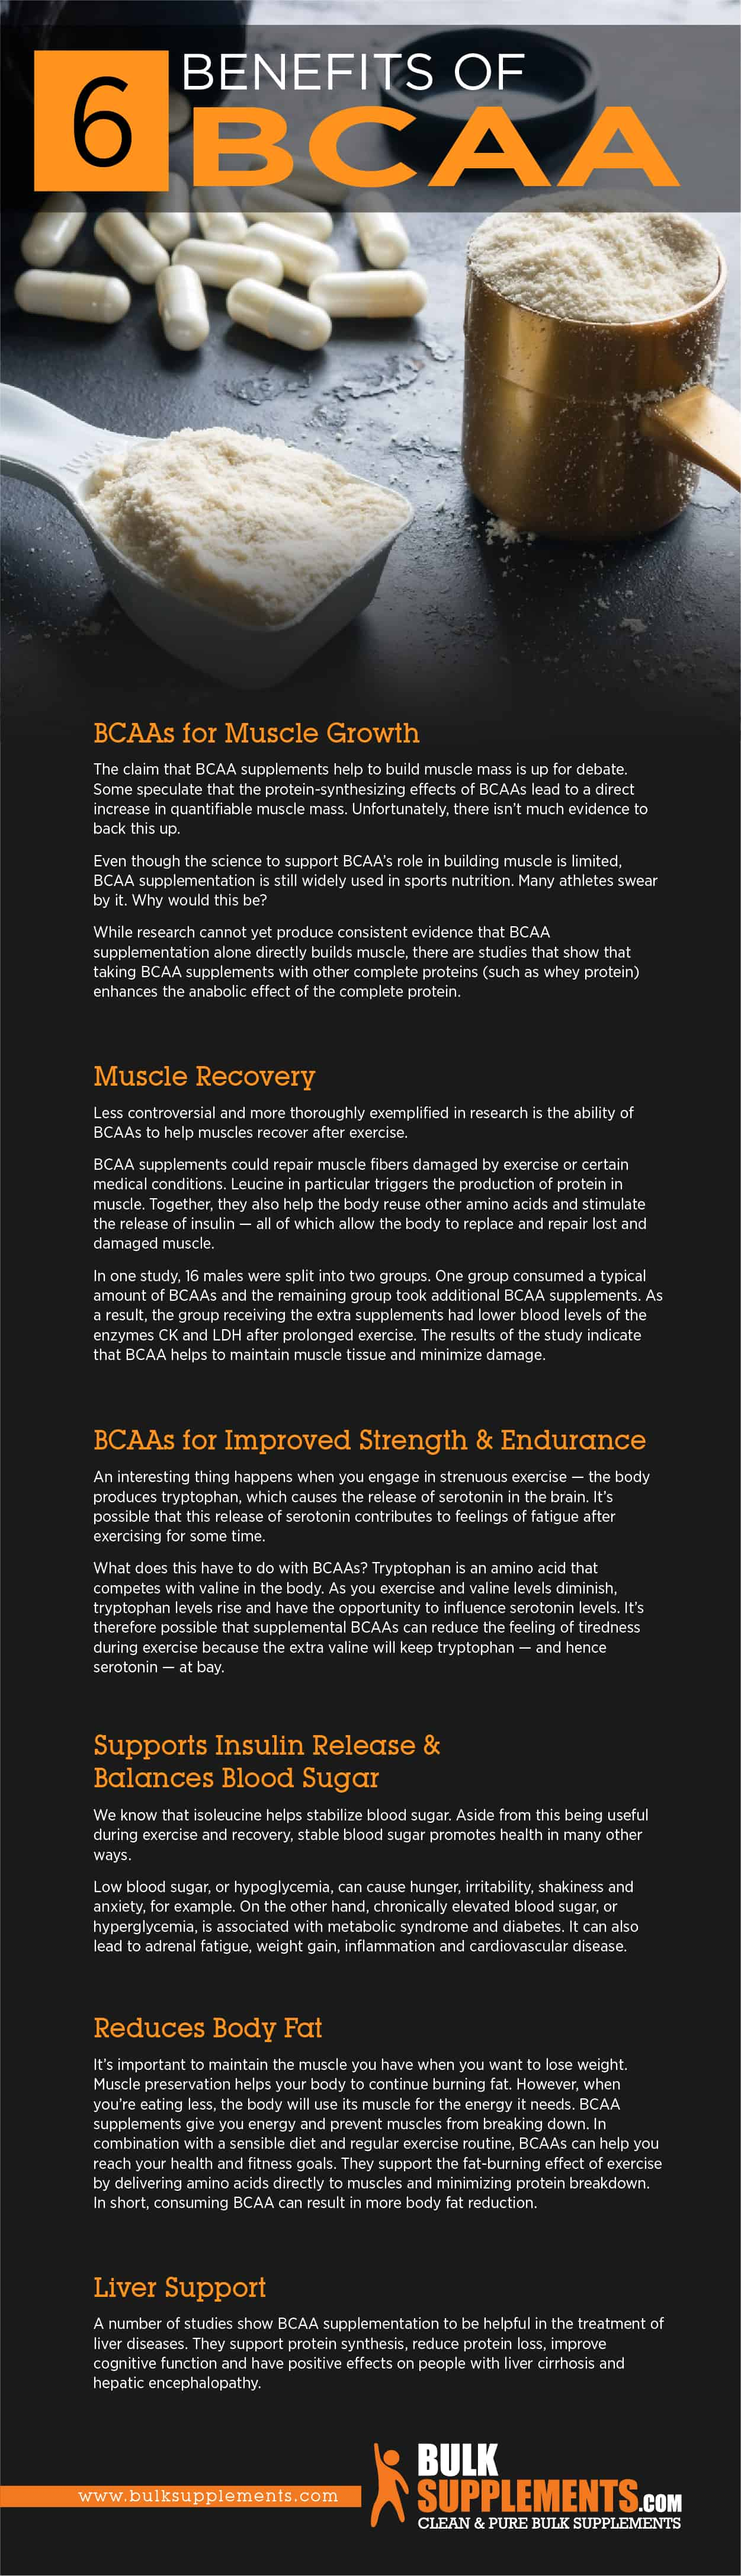 BCAA Benefits